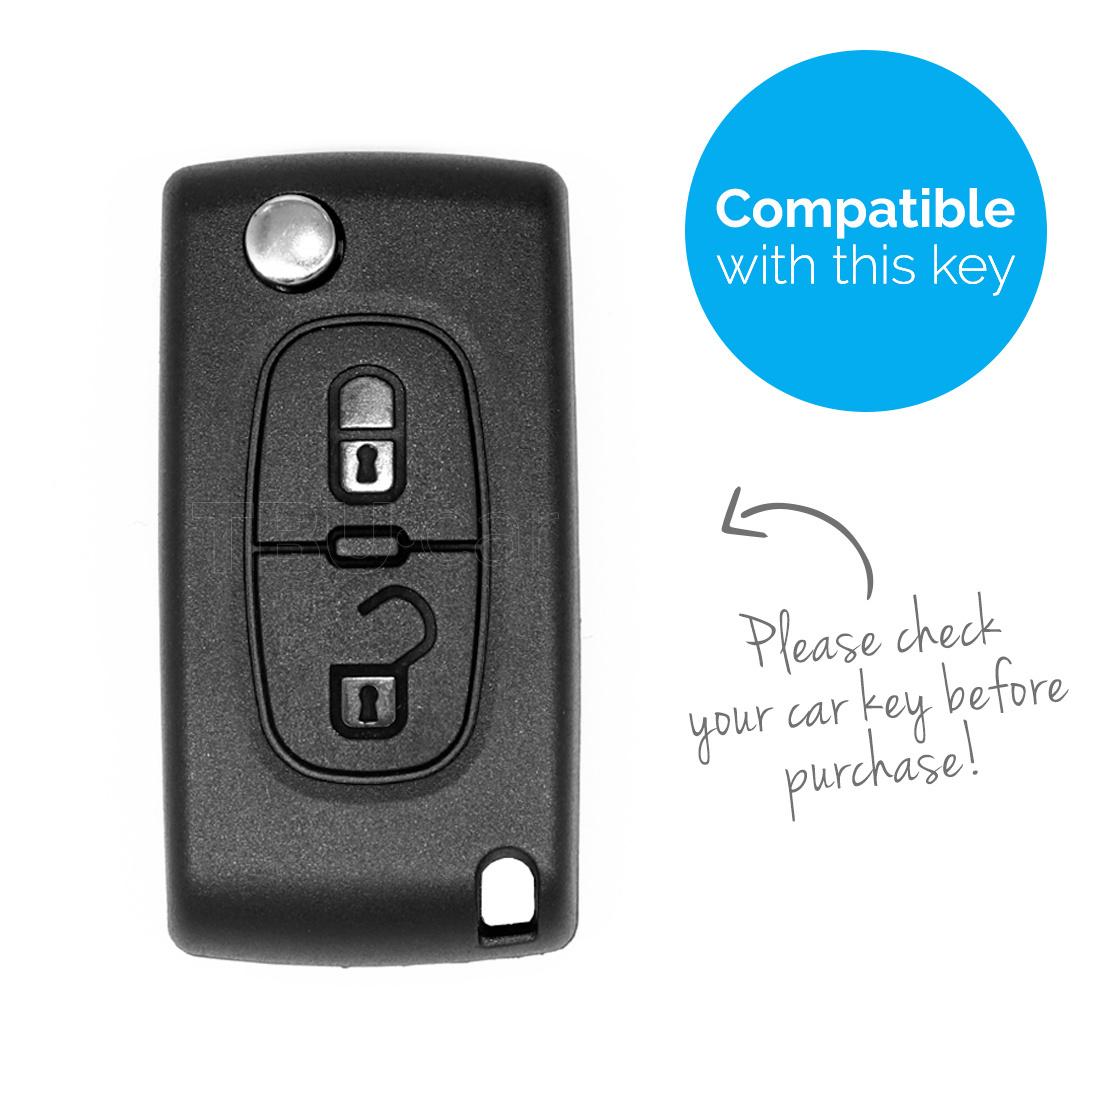 TBU car TBU car Autoschlüssel Hülle kompatibel mit Peugeot 2 Tasten - Schutzhülle aus Silikon - Auto Schlüsselhülle Cover in Weiß